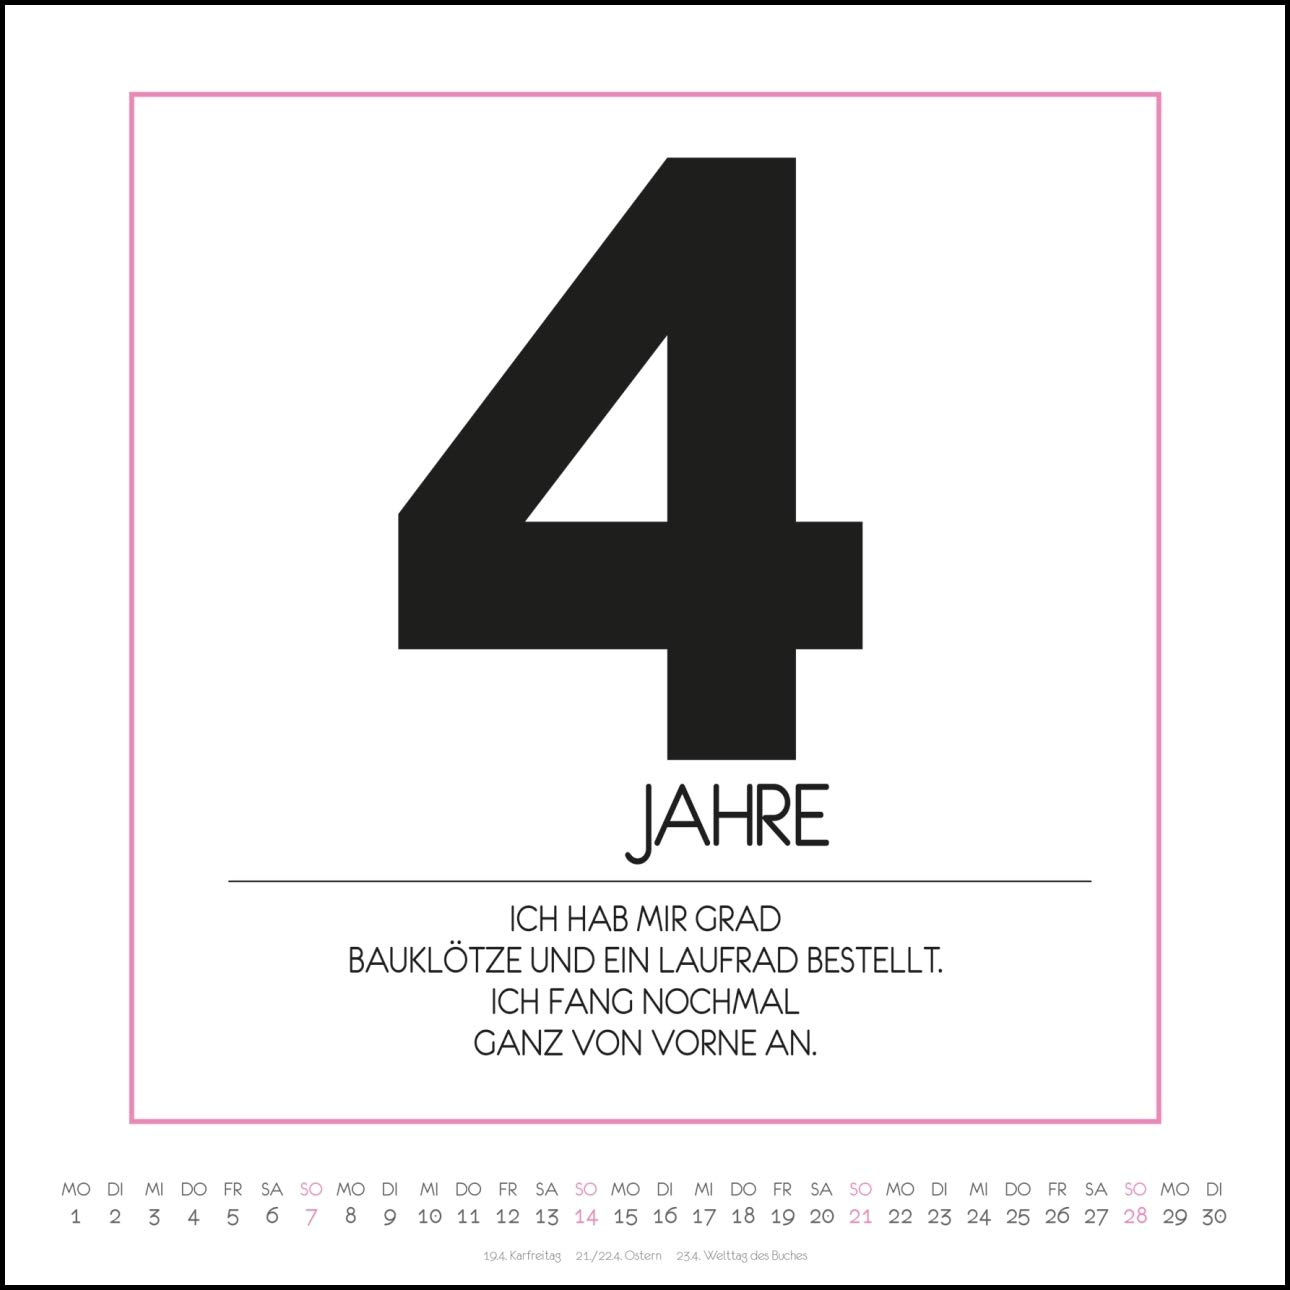 Buro Kalender 2019 Buro Spruche Von Funi Smart Art Quadrat Format